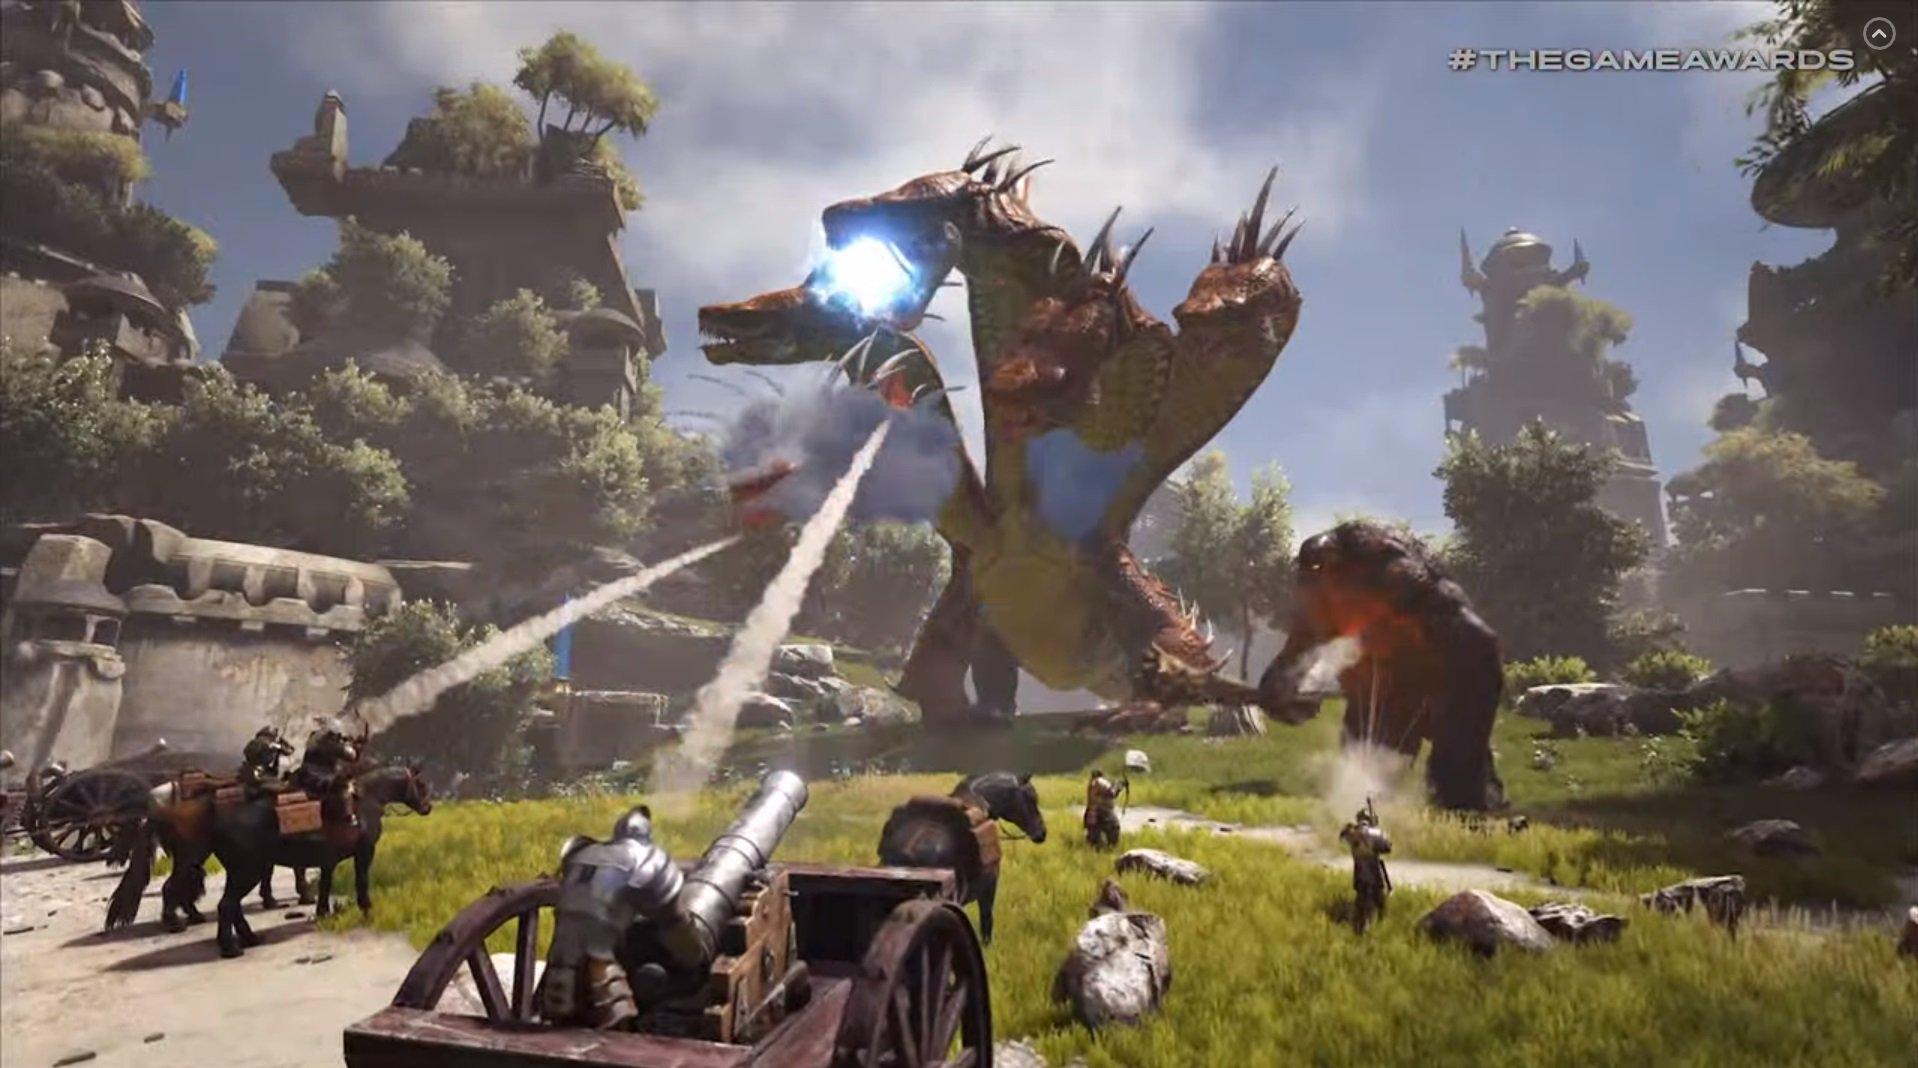 ATLAS: Game Awards 2018 Reveal Trailer